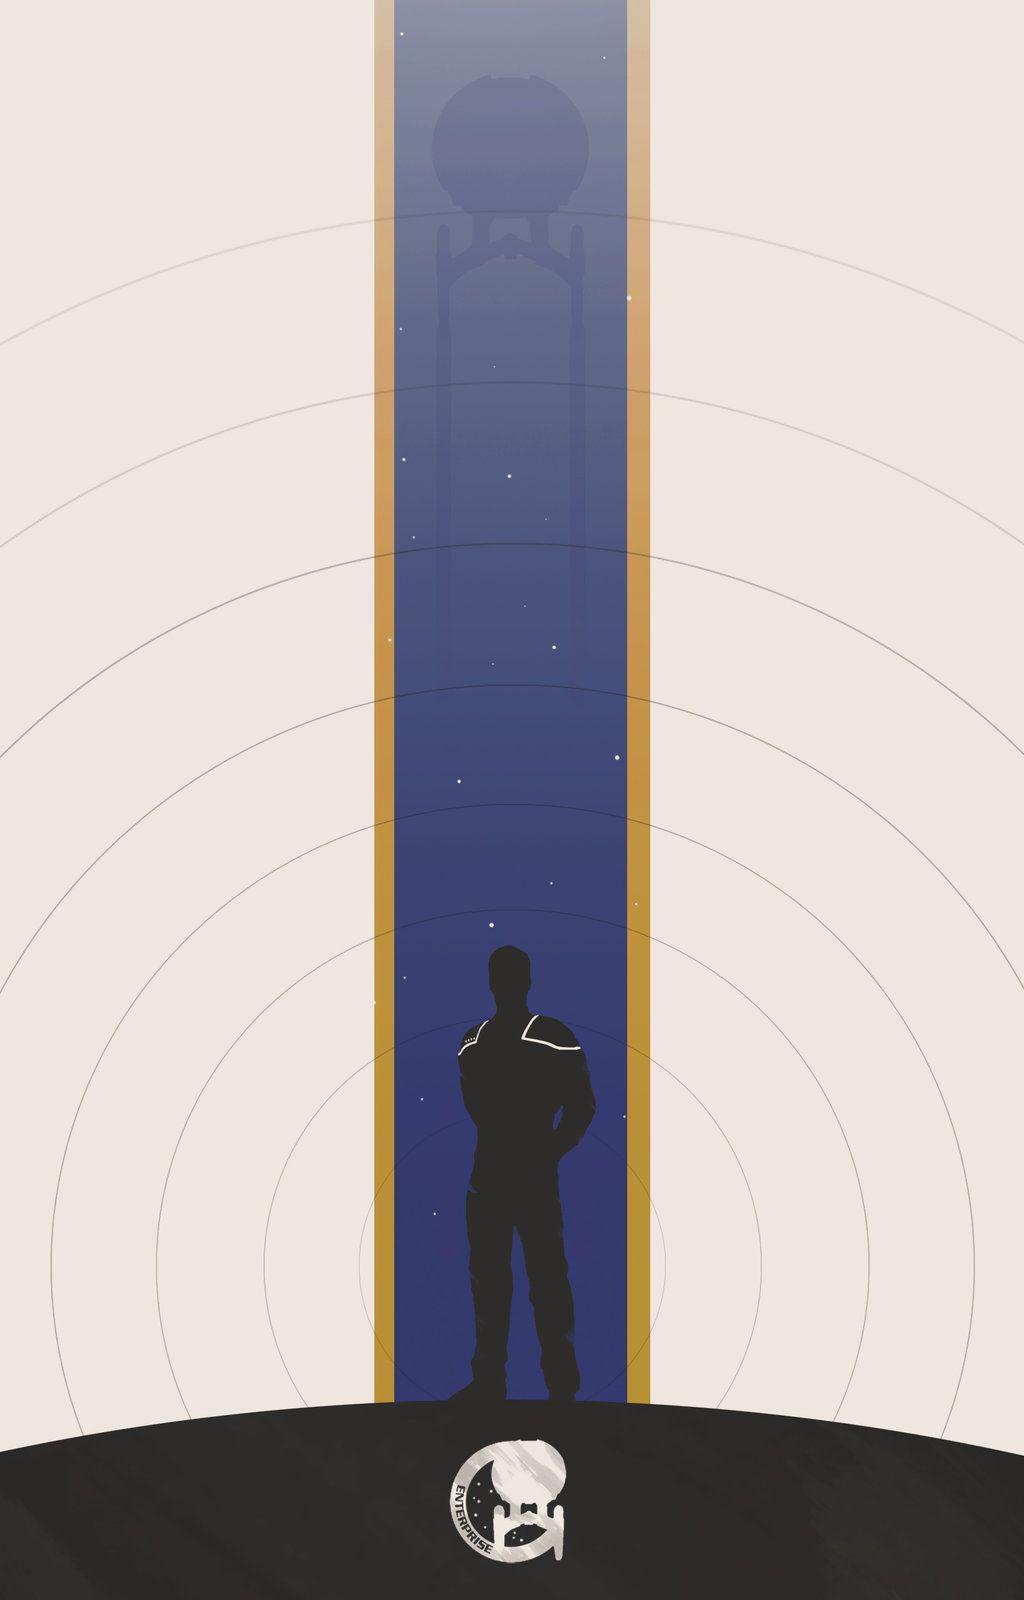 The Captains Of Star Trek Minimalist Posters Star Trek Wallpaper Star Trek Posters Star Trek Art